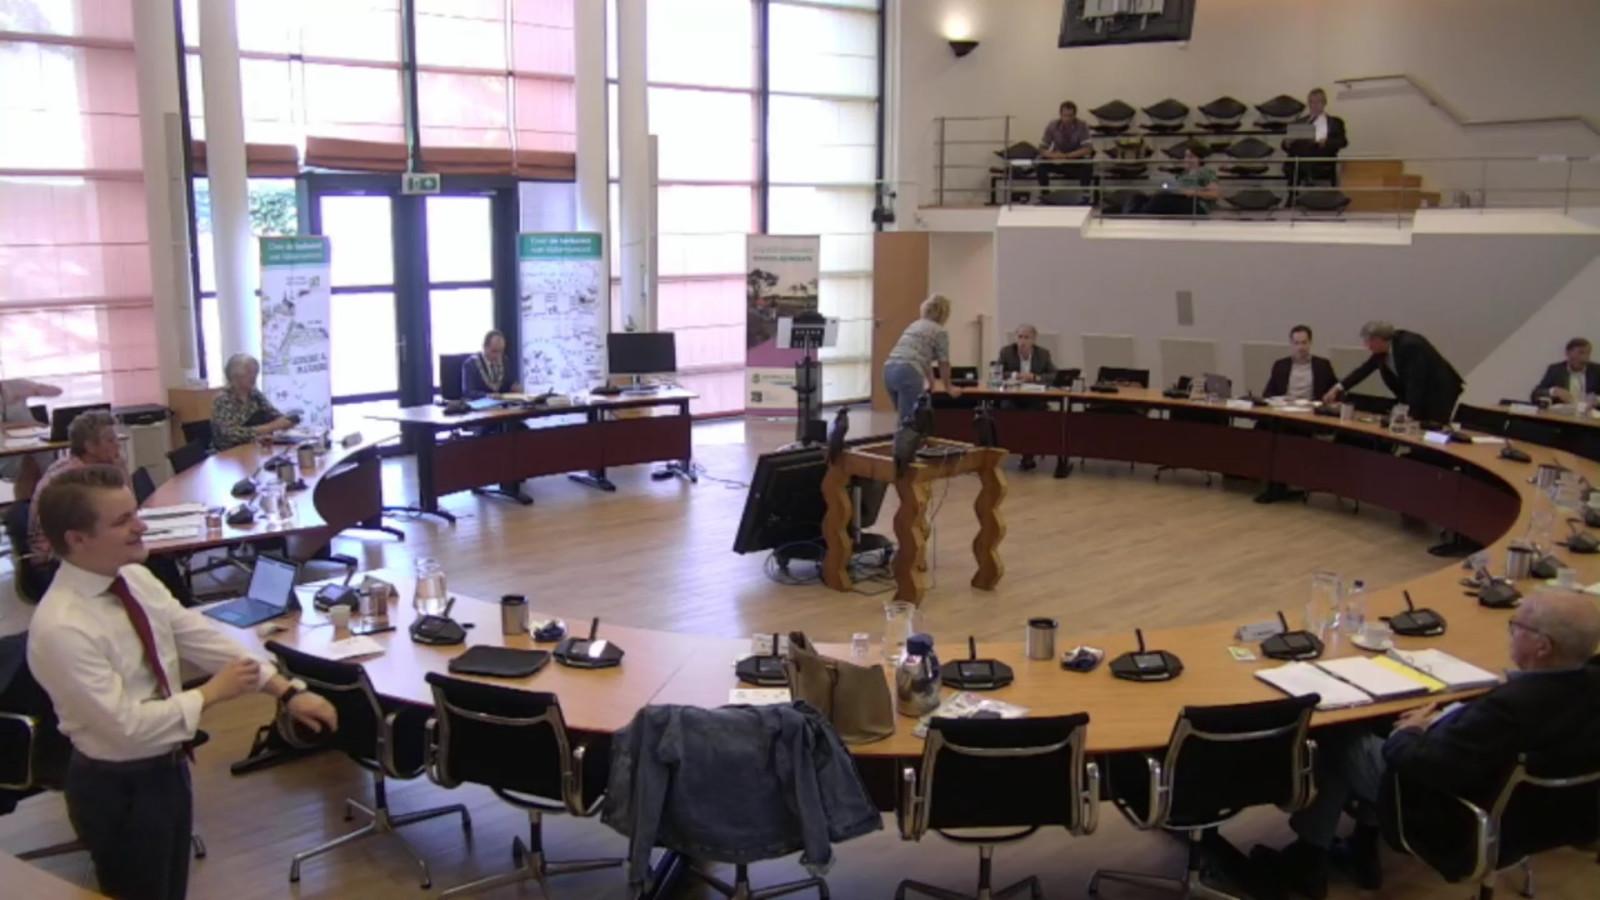 Beeld van de raadsvergadering in Valkenswaard van donderdag 28 mei 2020.